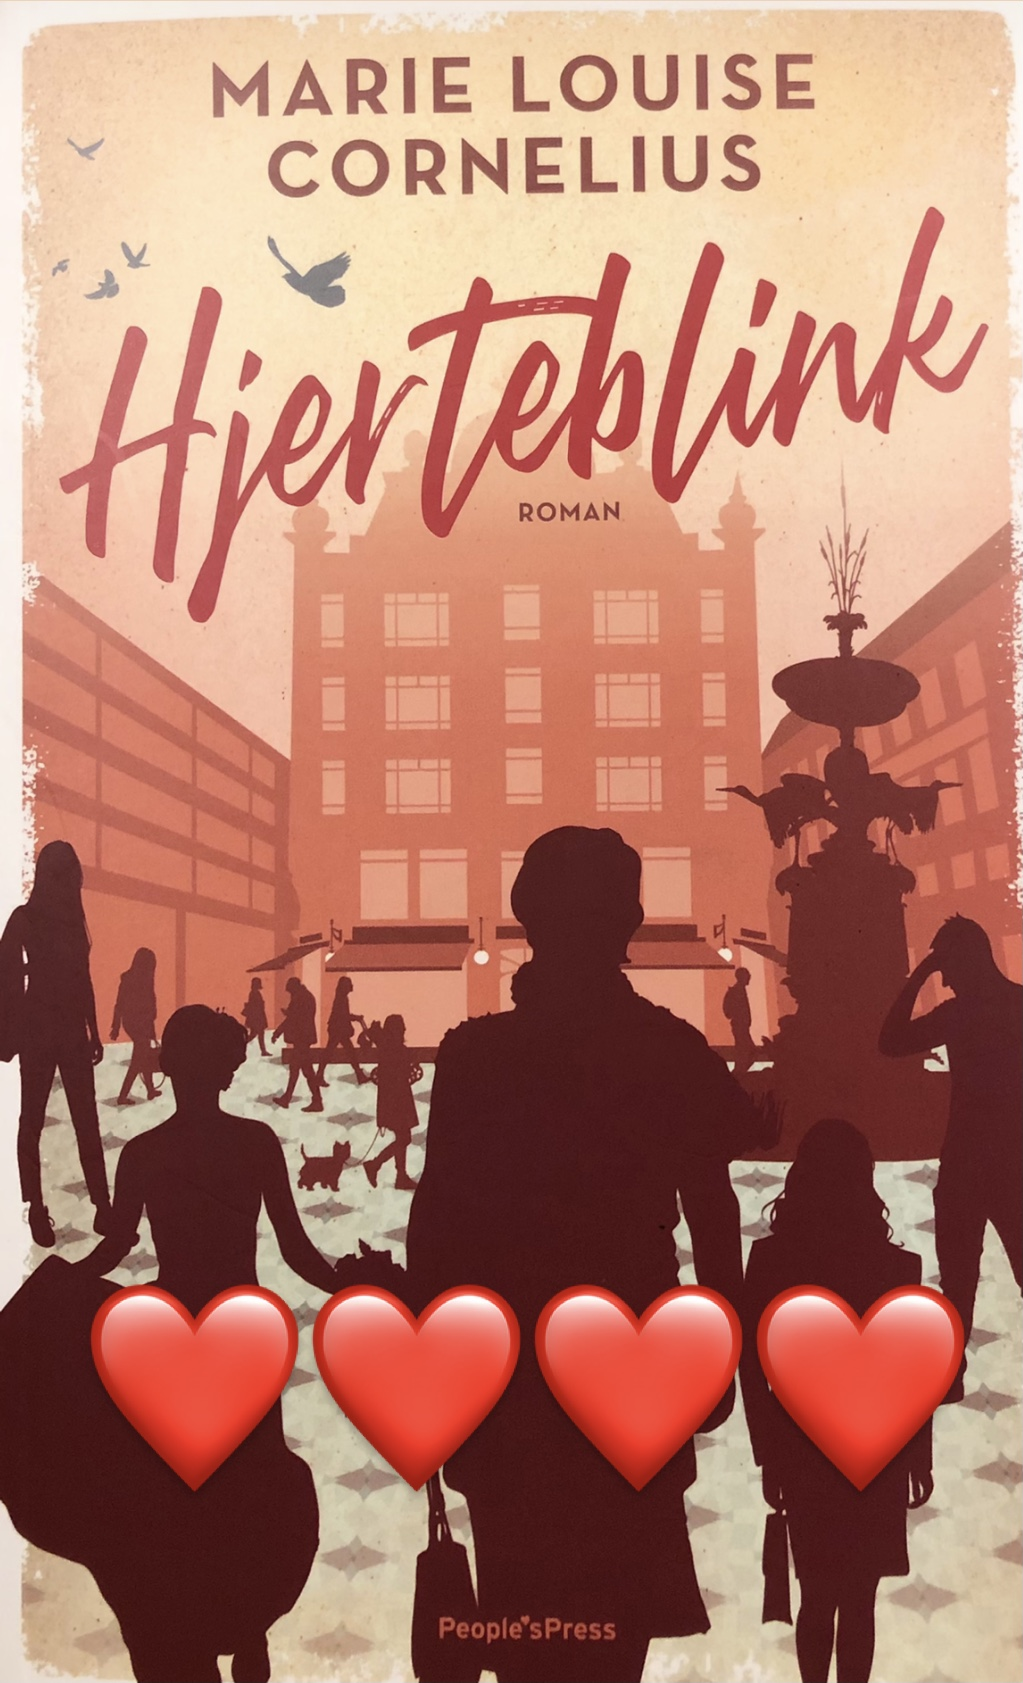 Hjerteblink, Marie Louise Cornelius, Peoples Press, debutant, debutroman, Hjertebånd, roman, kærlighed, krummeskrummelurer, krummeskrummelurer.dk, boganmeldelse, anbefaling, anmeldereksemplar,